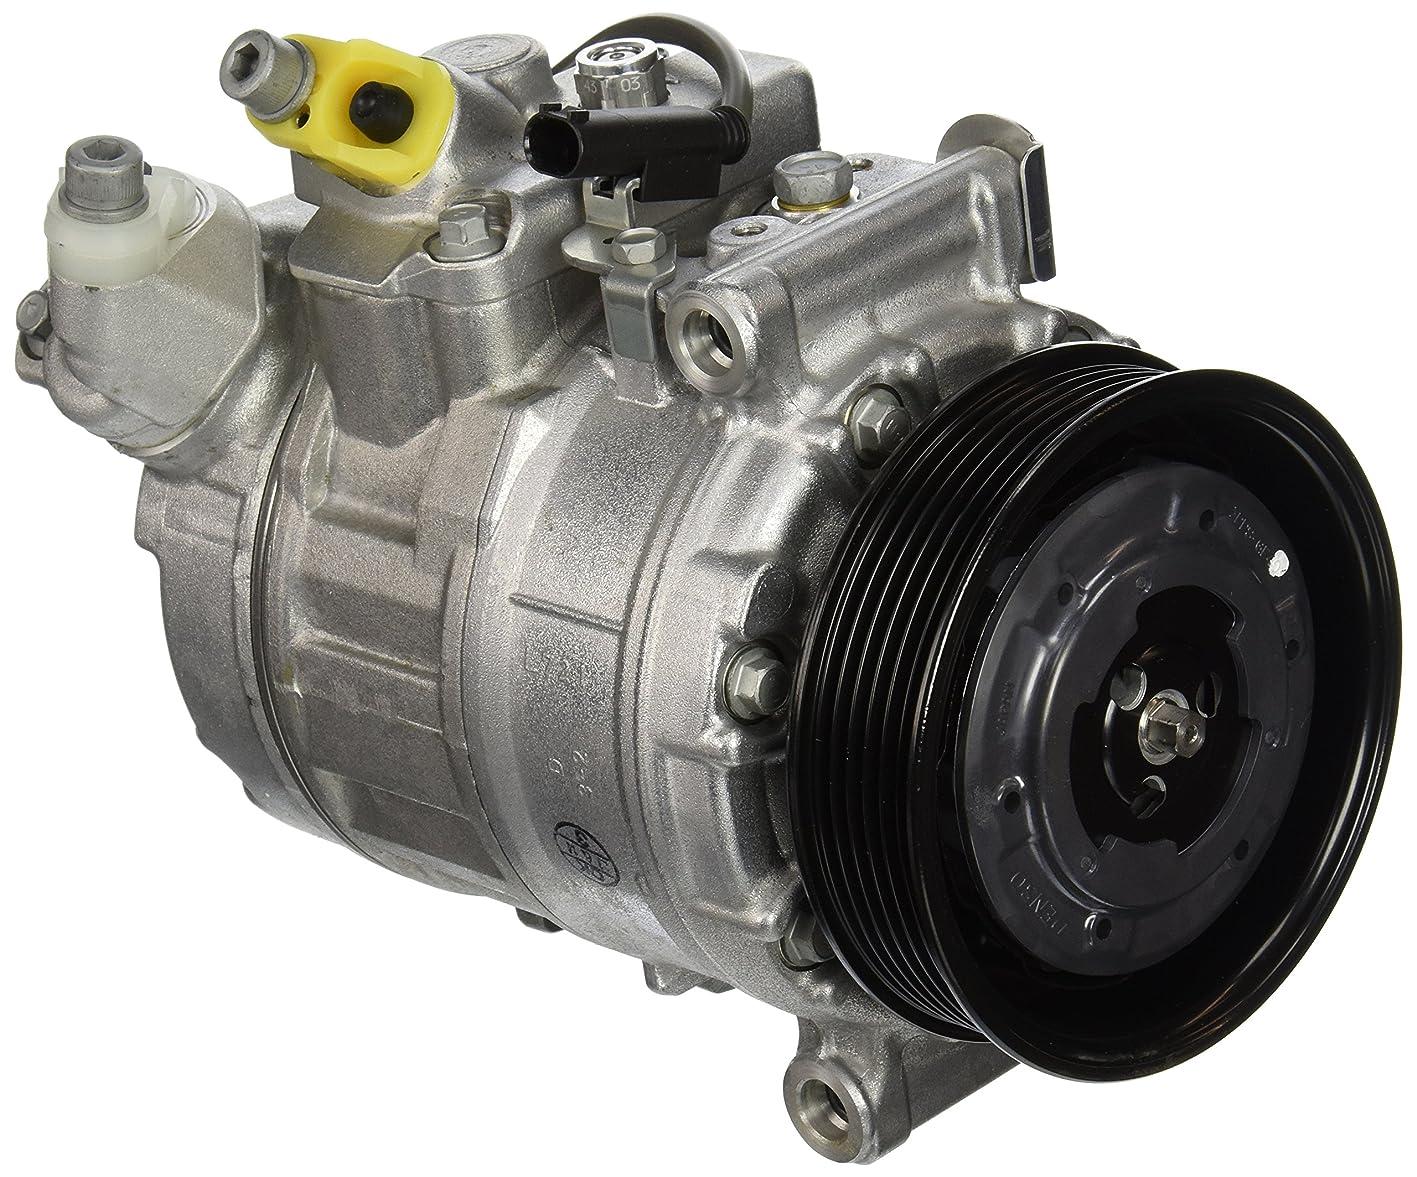 Denso 471-1542 A/C Compressor xvmgondqhcs883